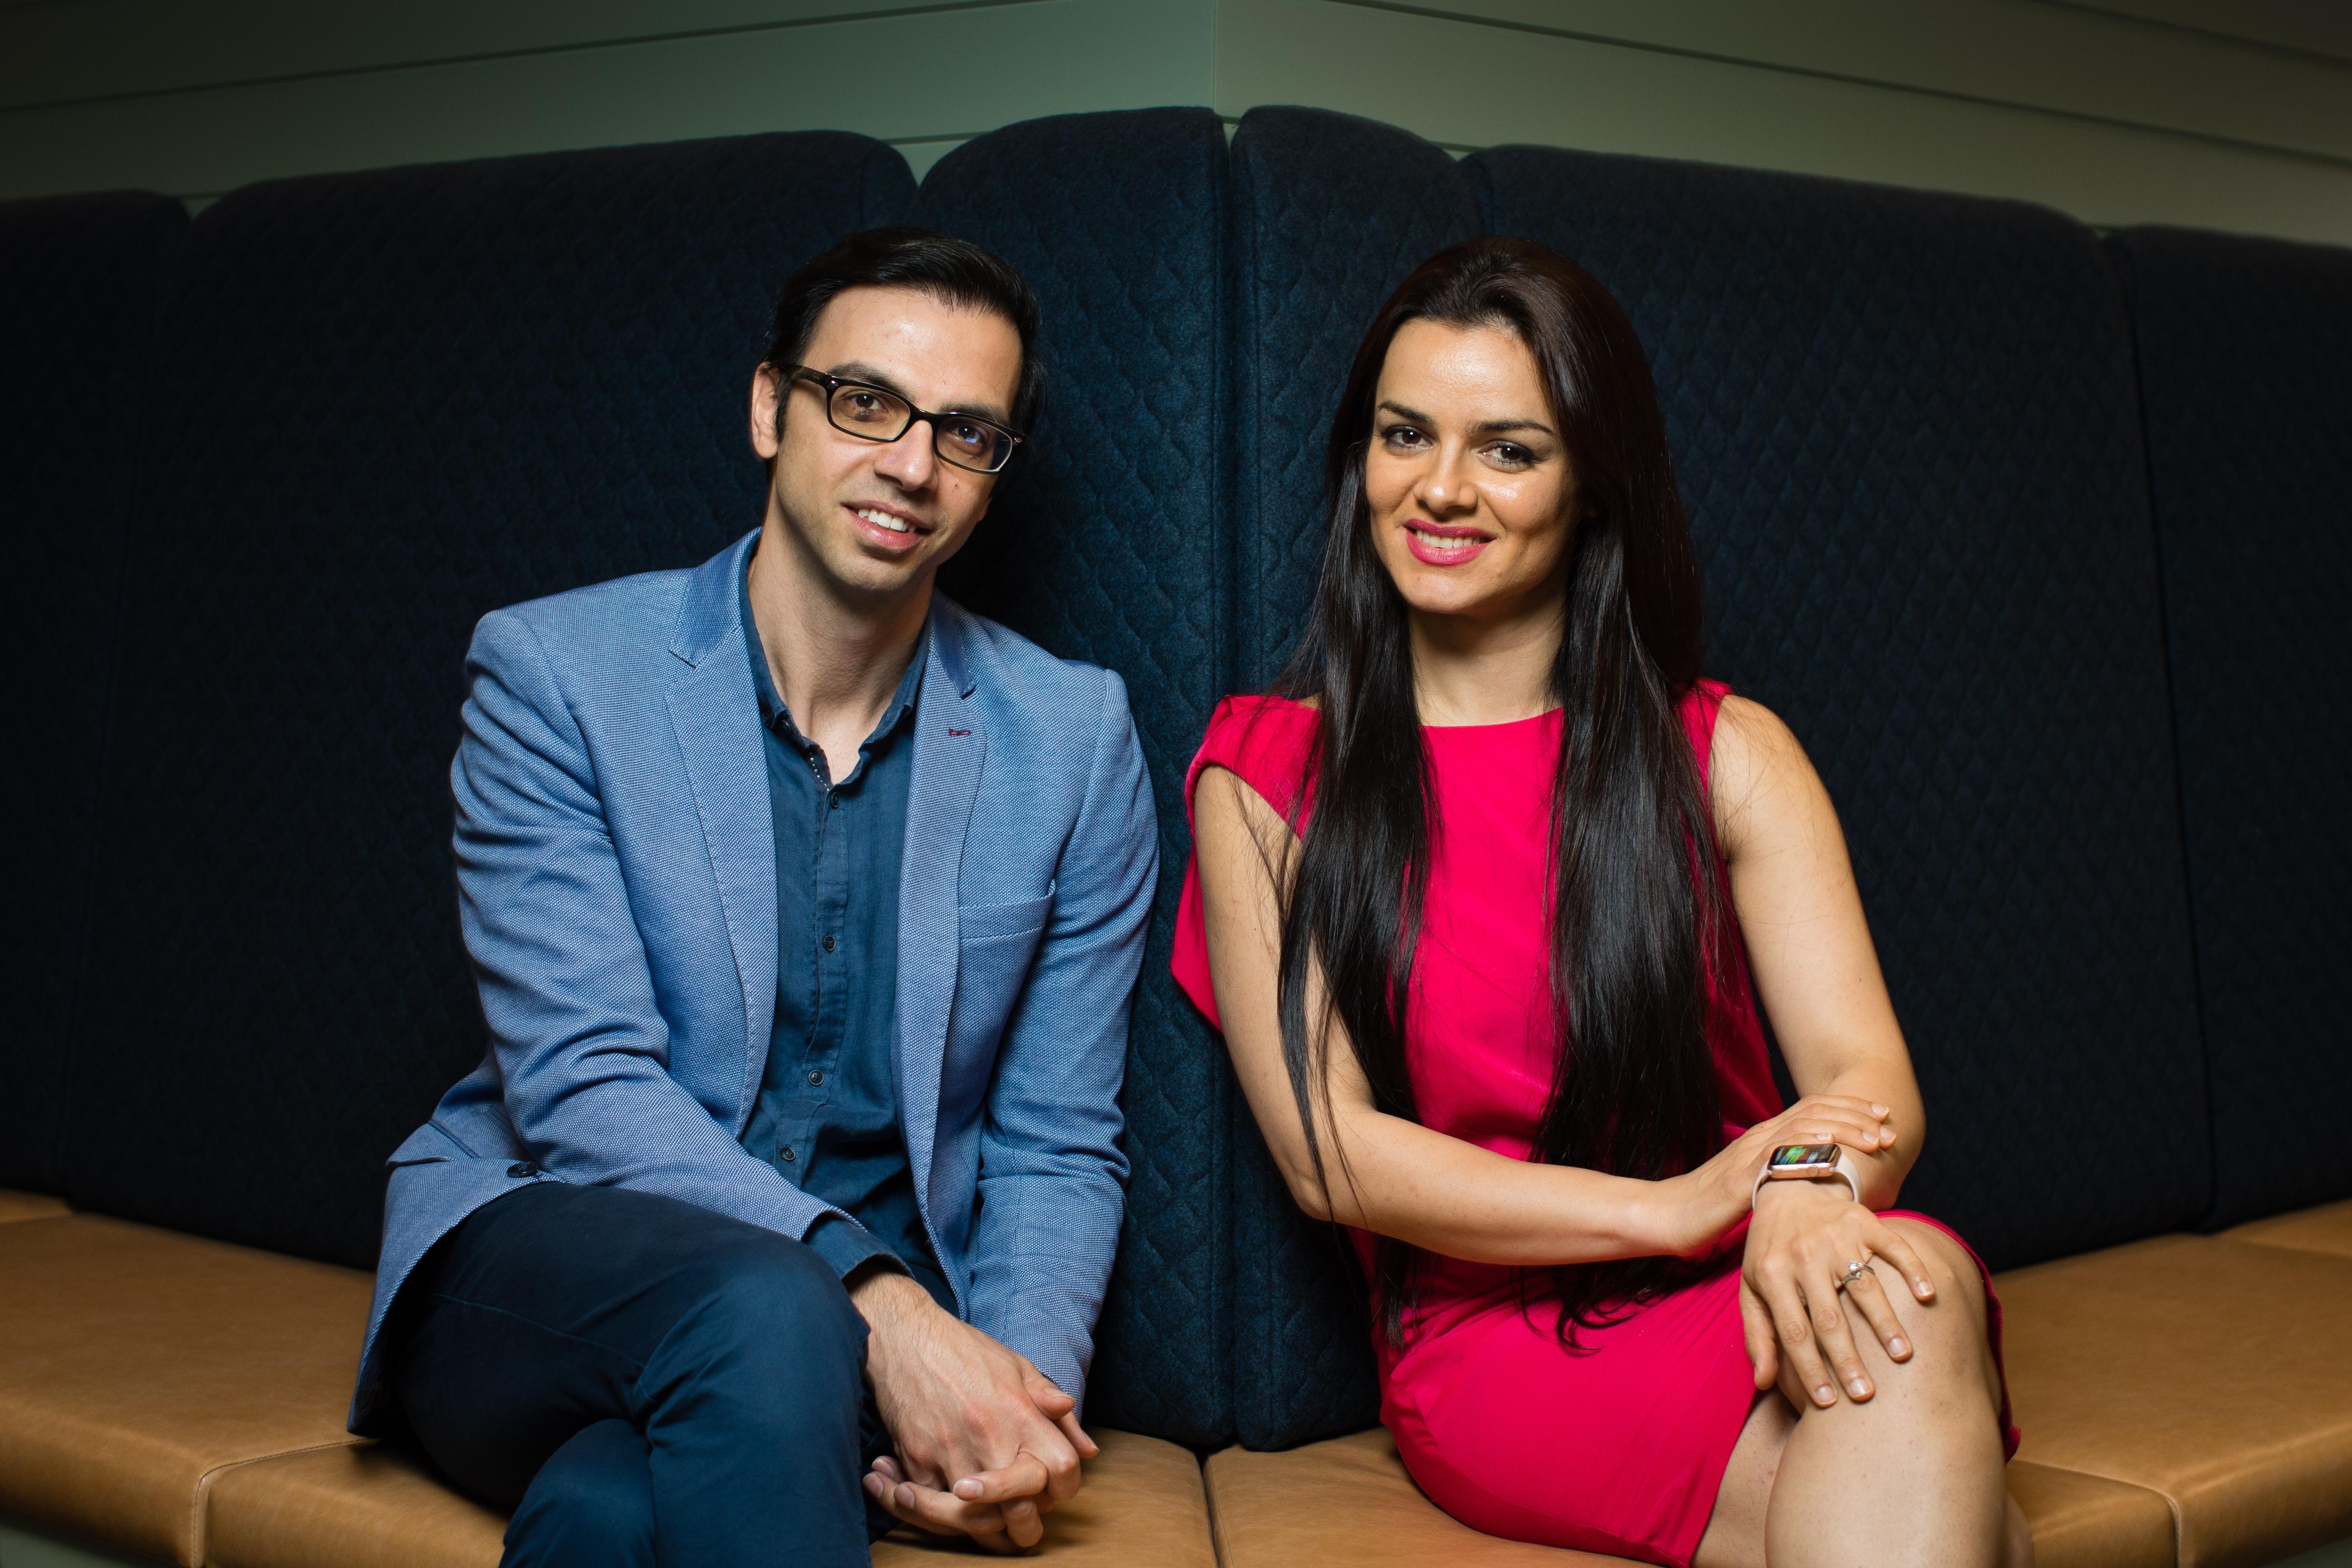 Maryam Sadeghi and Majid Razmara - MetaOptima